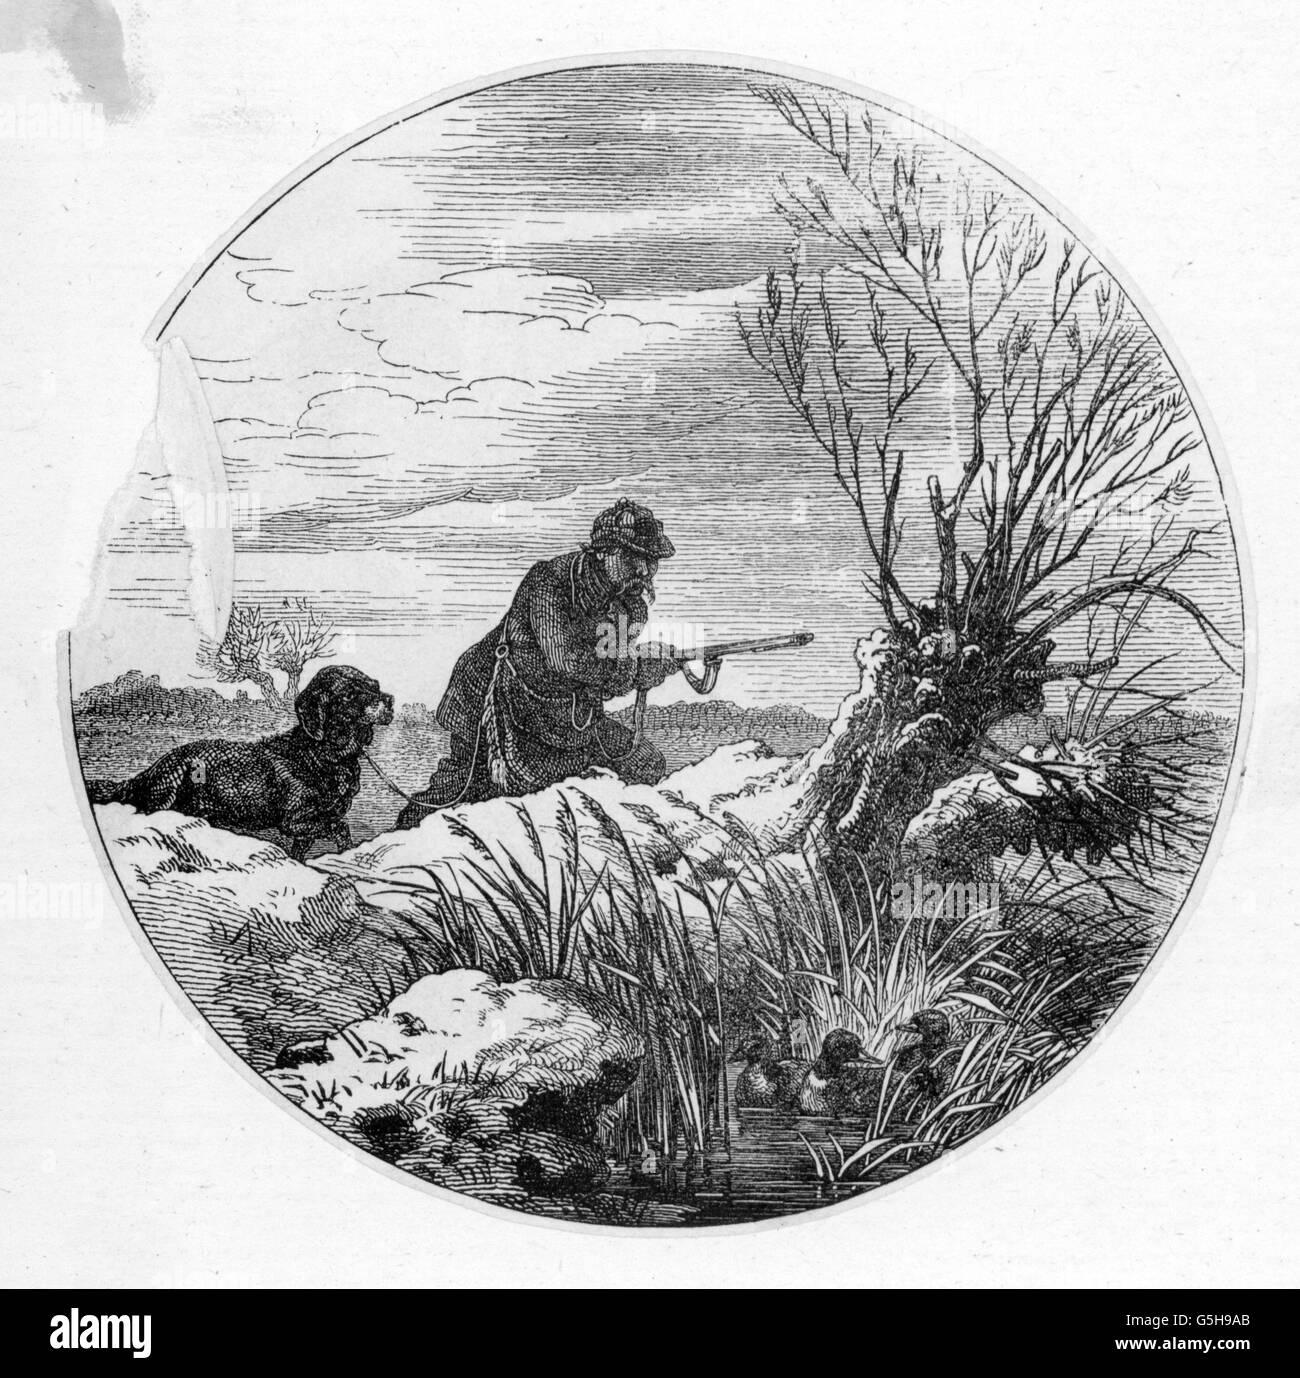 hunting, ducks, duck hunting, wood engraving, 19th century, 19th century, graphic, graphics, half length, hunter, Stock Photo